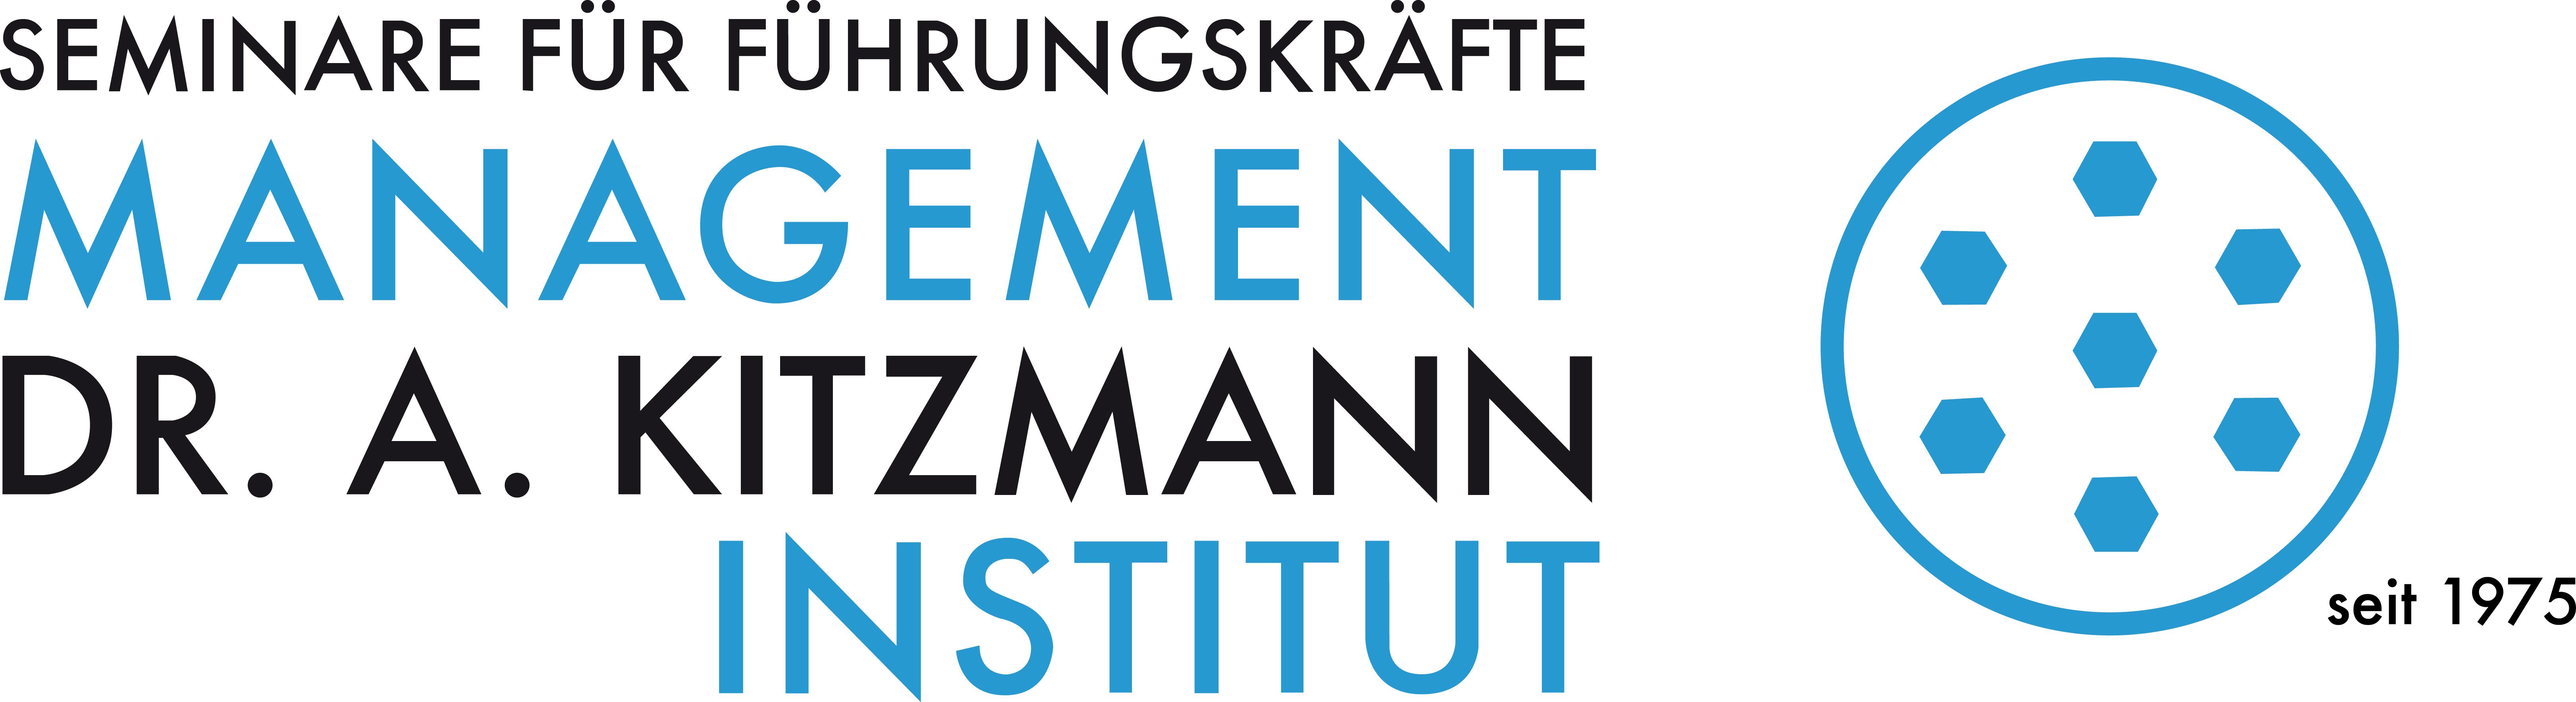 Cover zu Programmheft 2019 - Management-Institut Dr. A. Kitzmann